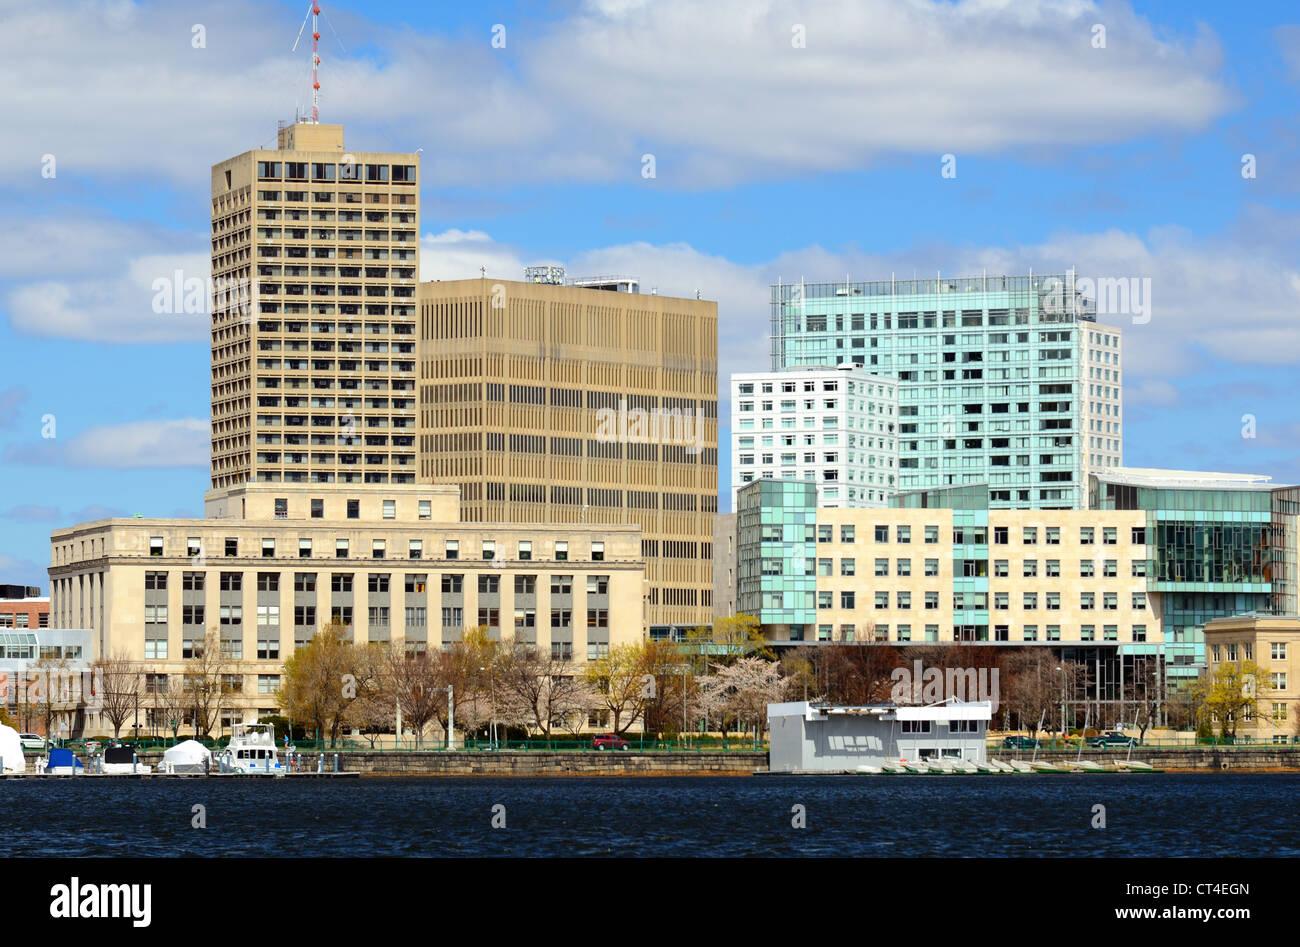 Skyline of Cambridge, Massachusetts from across the Charles River. - Stock Image